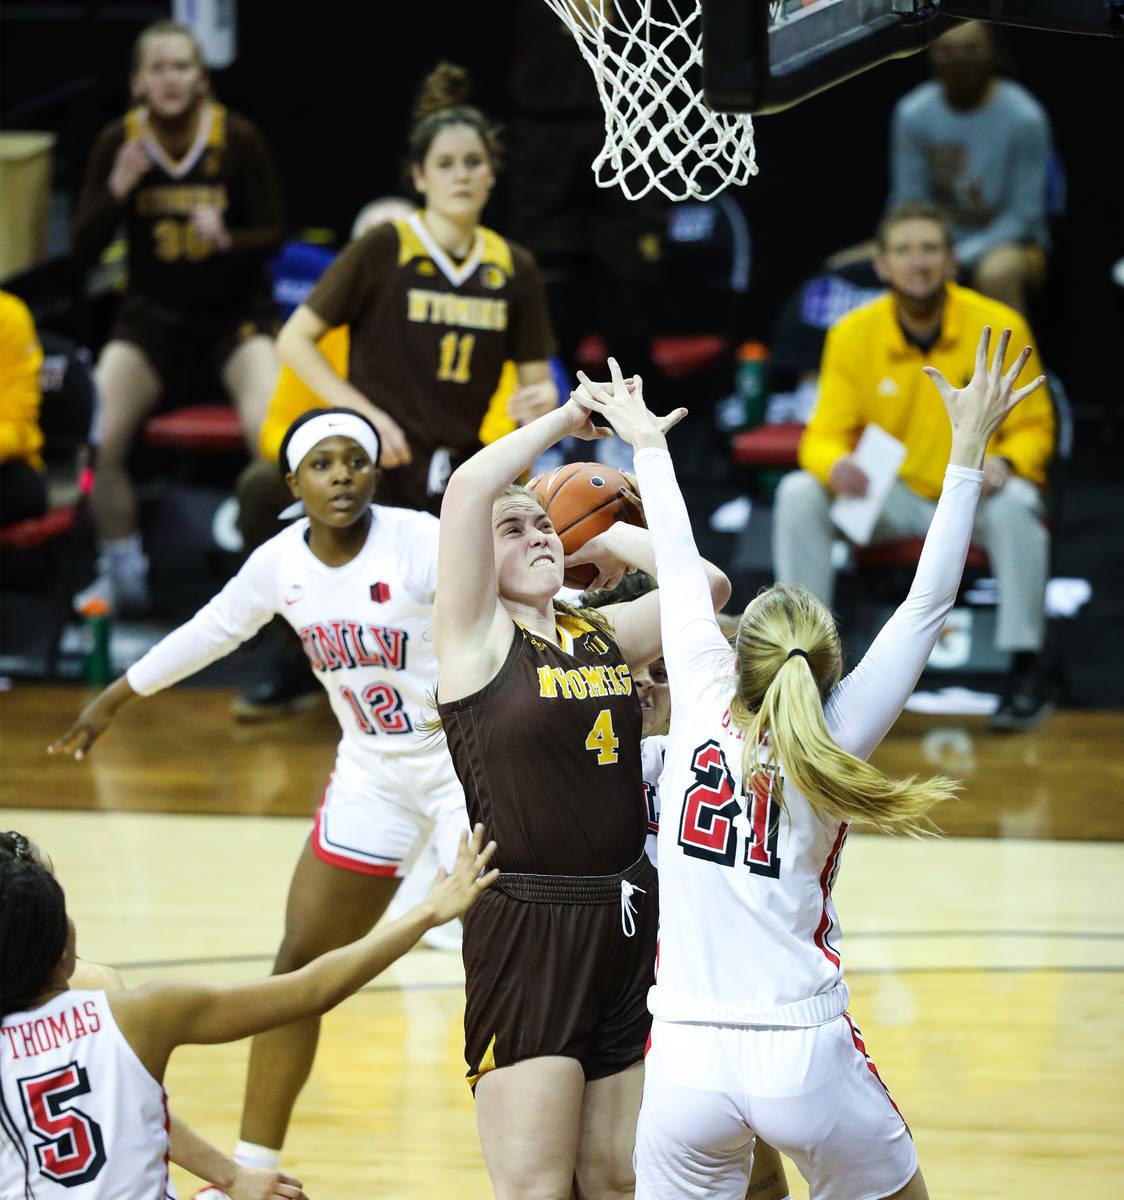 Wyoming guard Grace Ellis (4) shoots a basket against UNLV center Delaynie Byrne (21) in the se ...